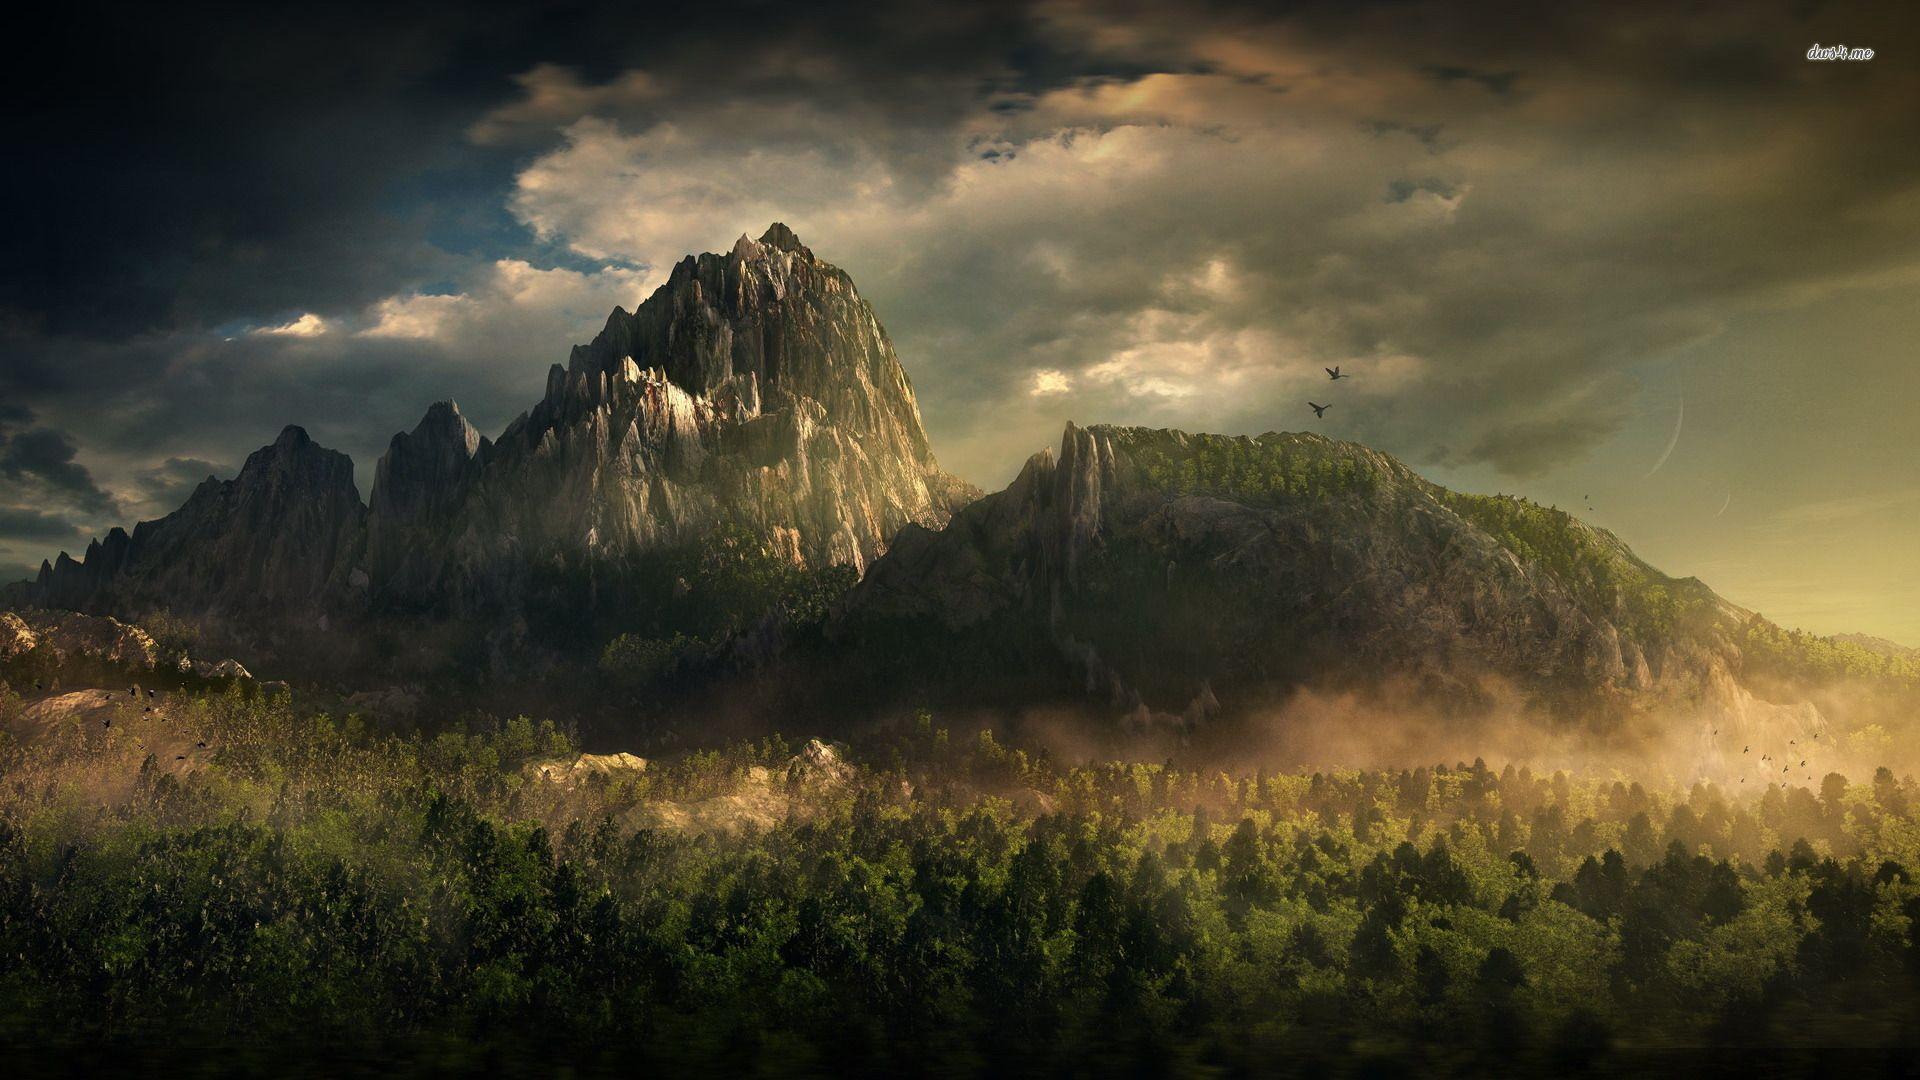 Dark Nature Wallpapers - Top Free Dark Nature Backgrounds